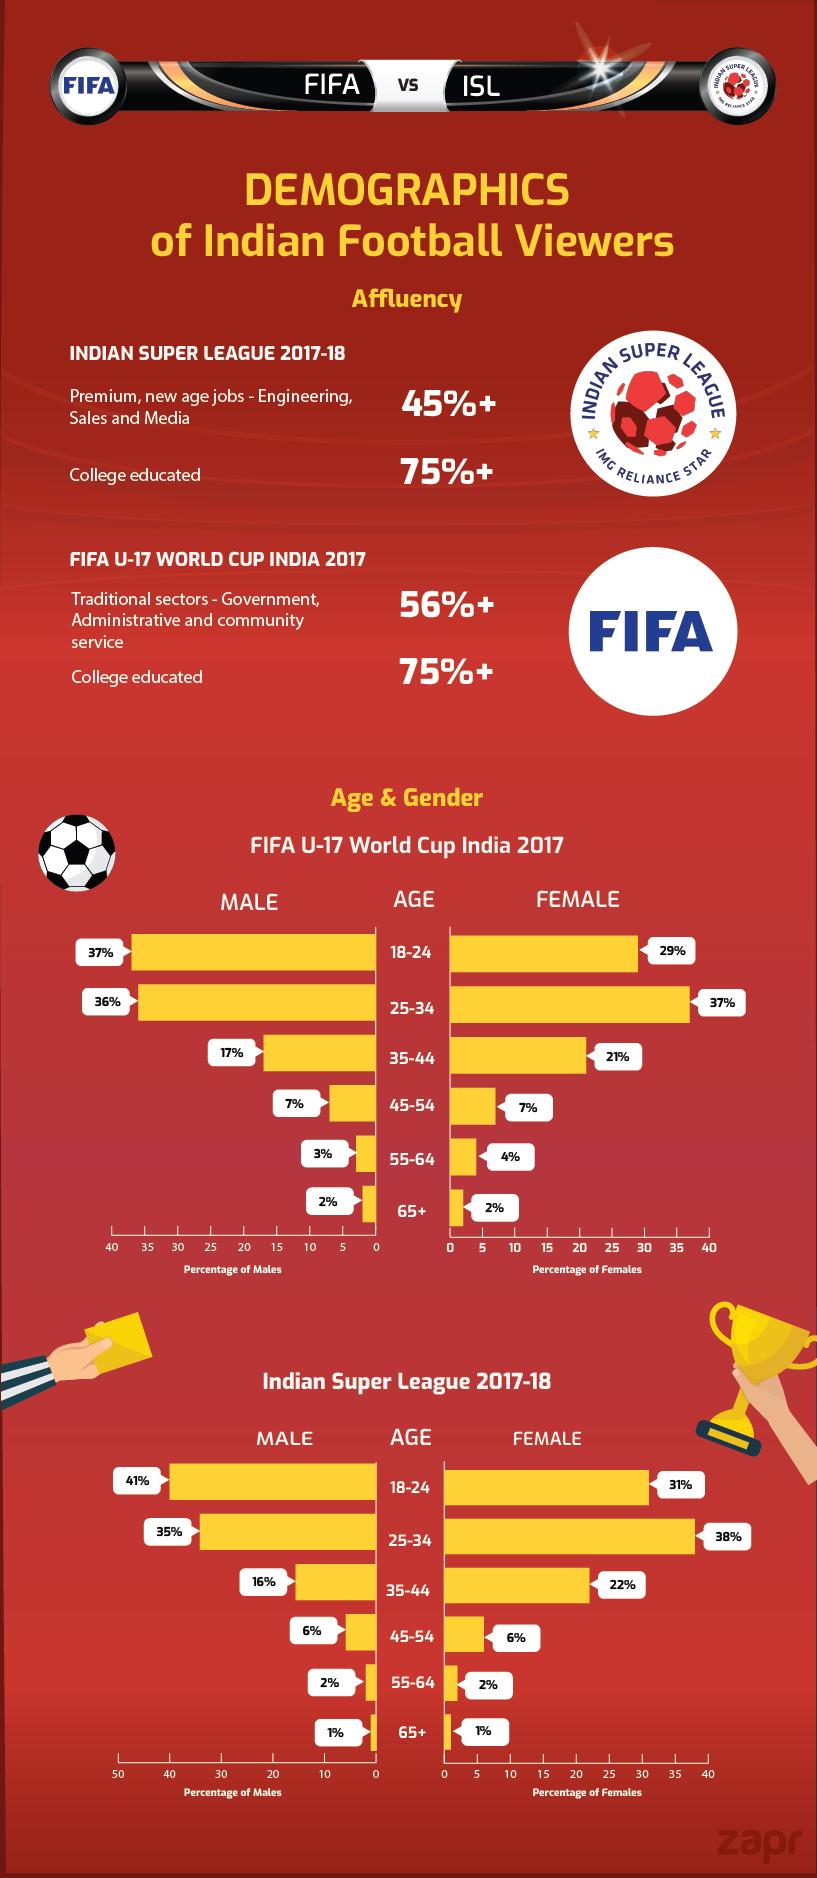 FIFA U-17, ISL TV viewership demography, affluency